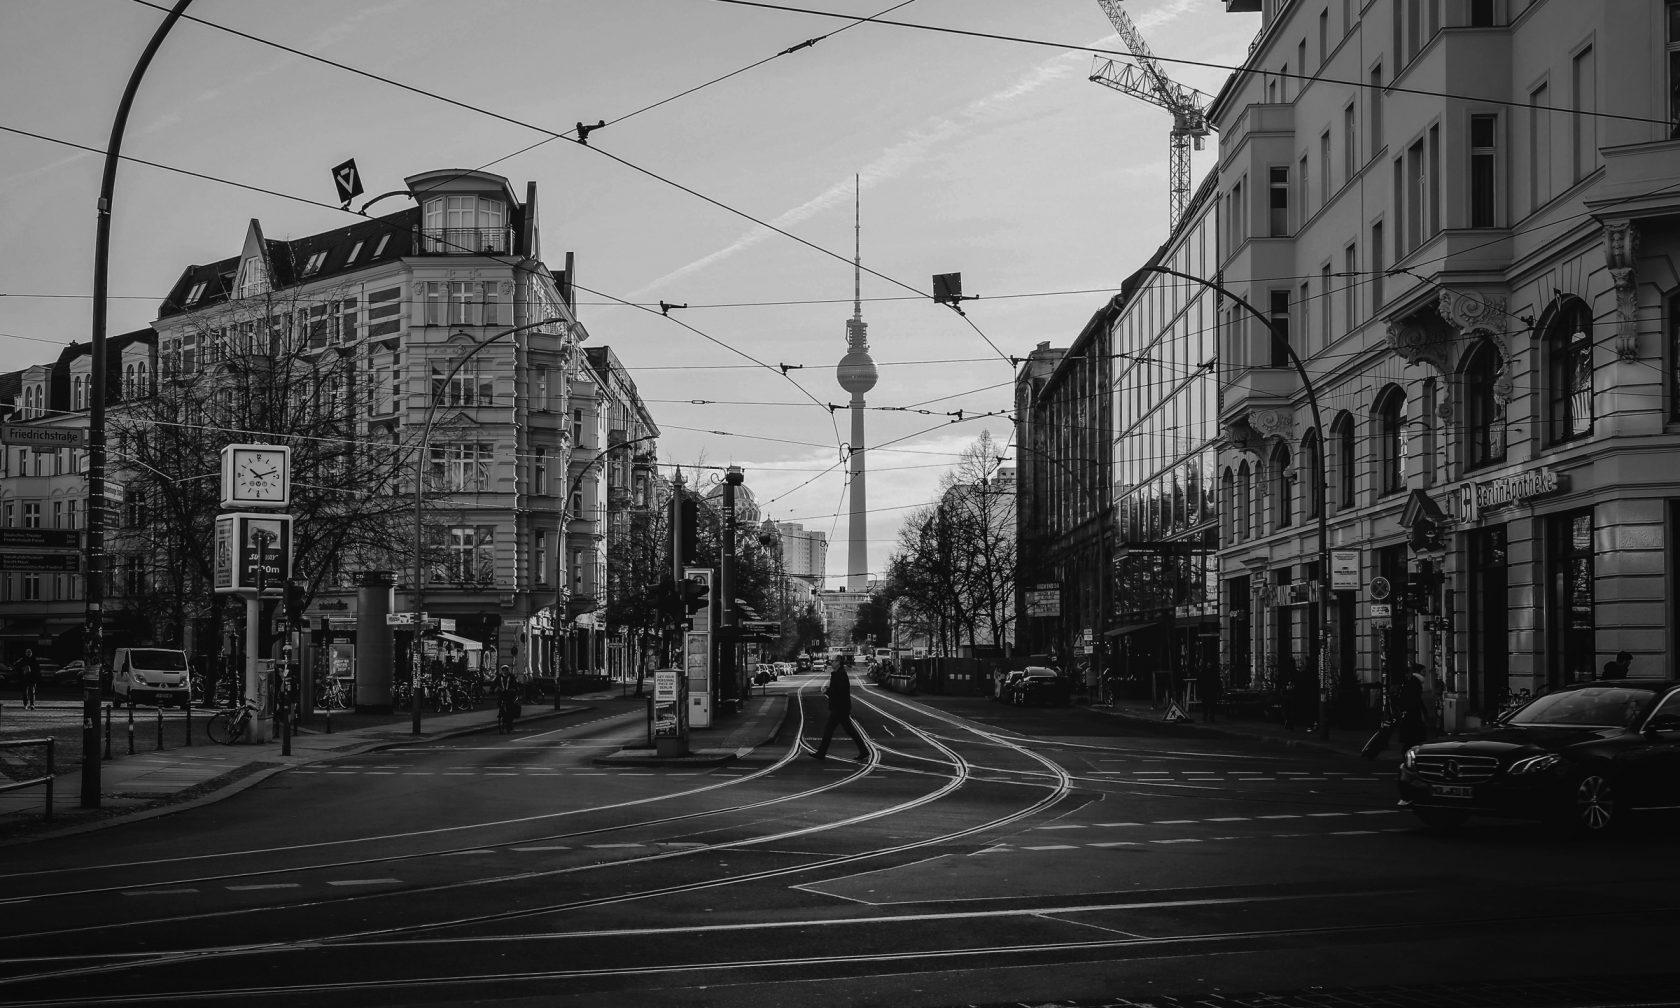 kae_berlin02_desktop